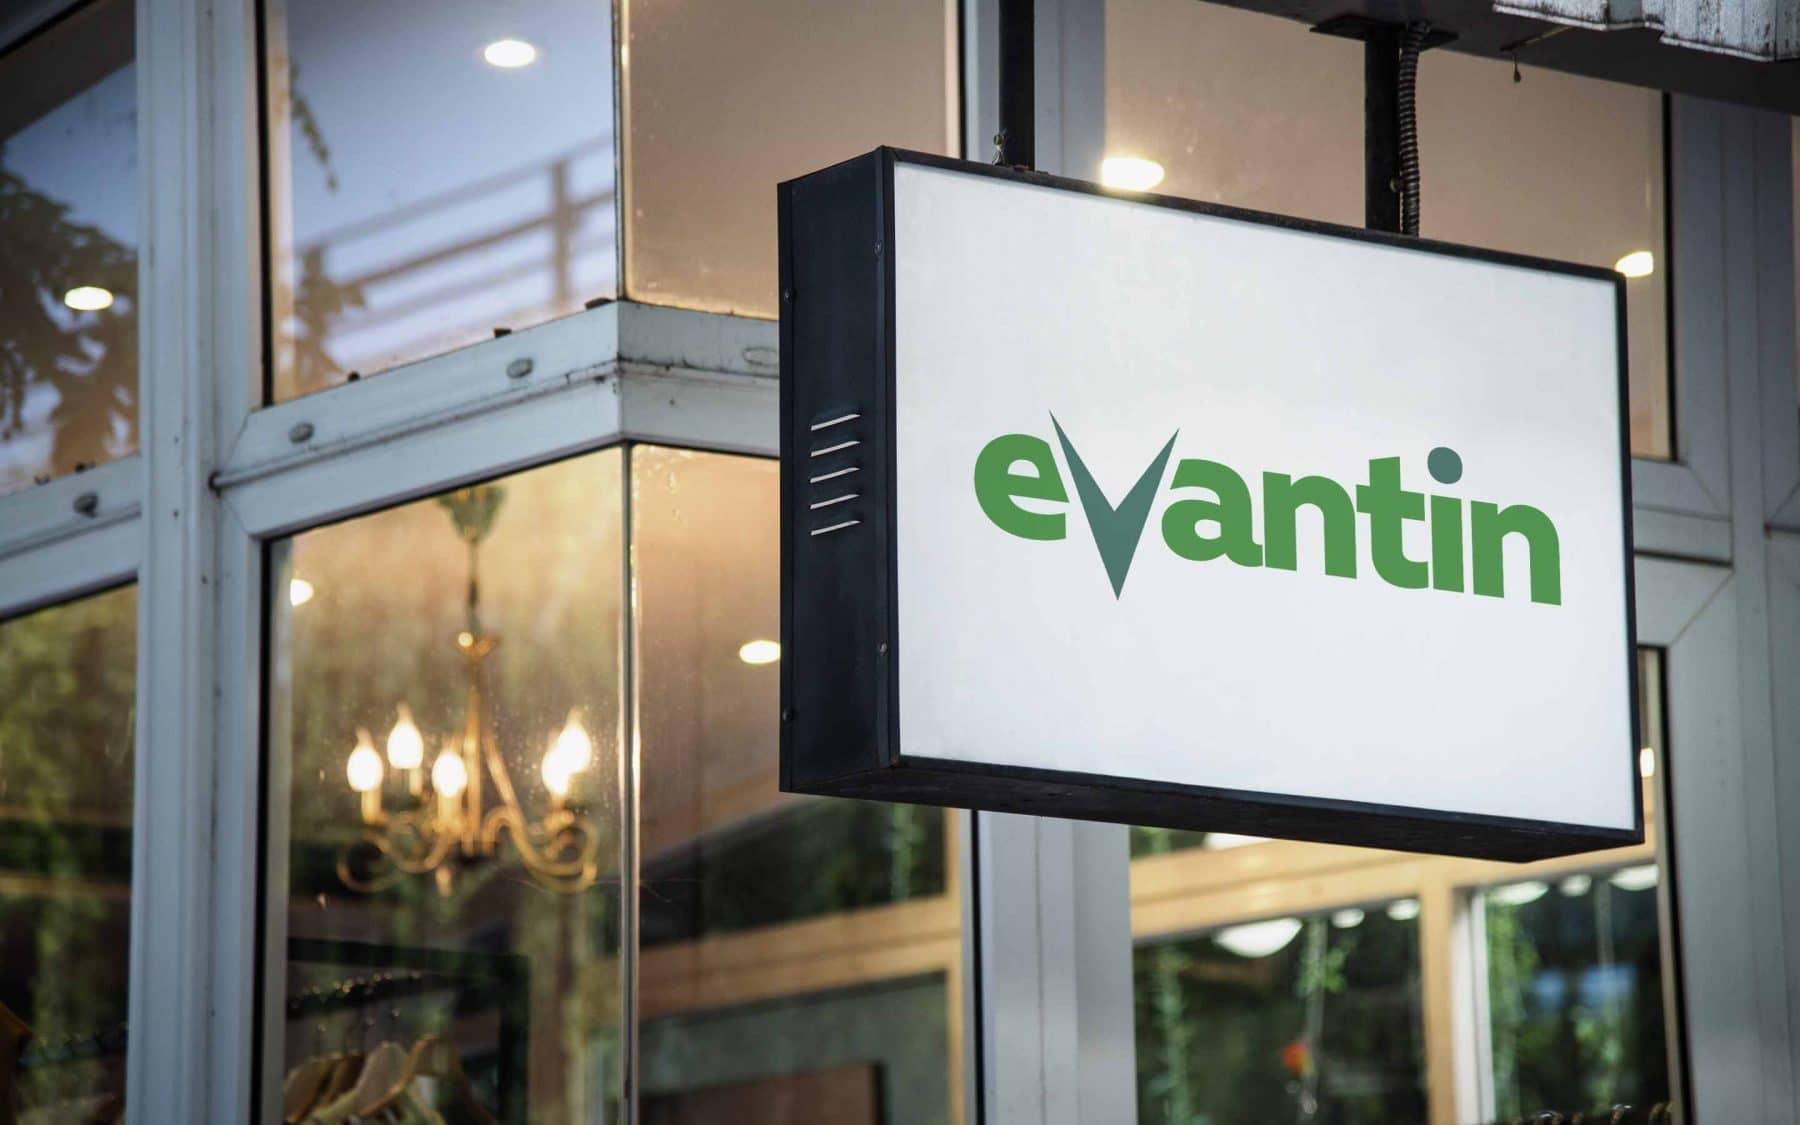 Evantin 3